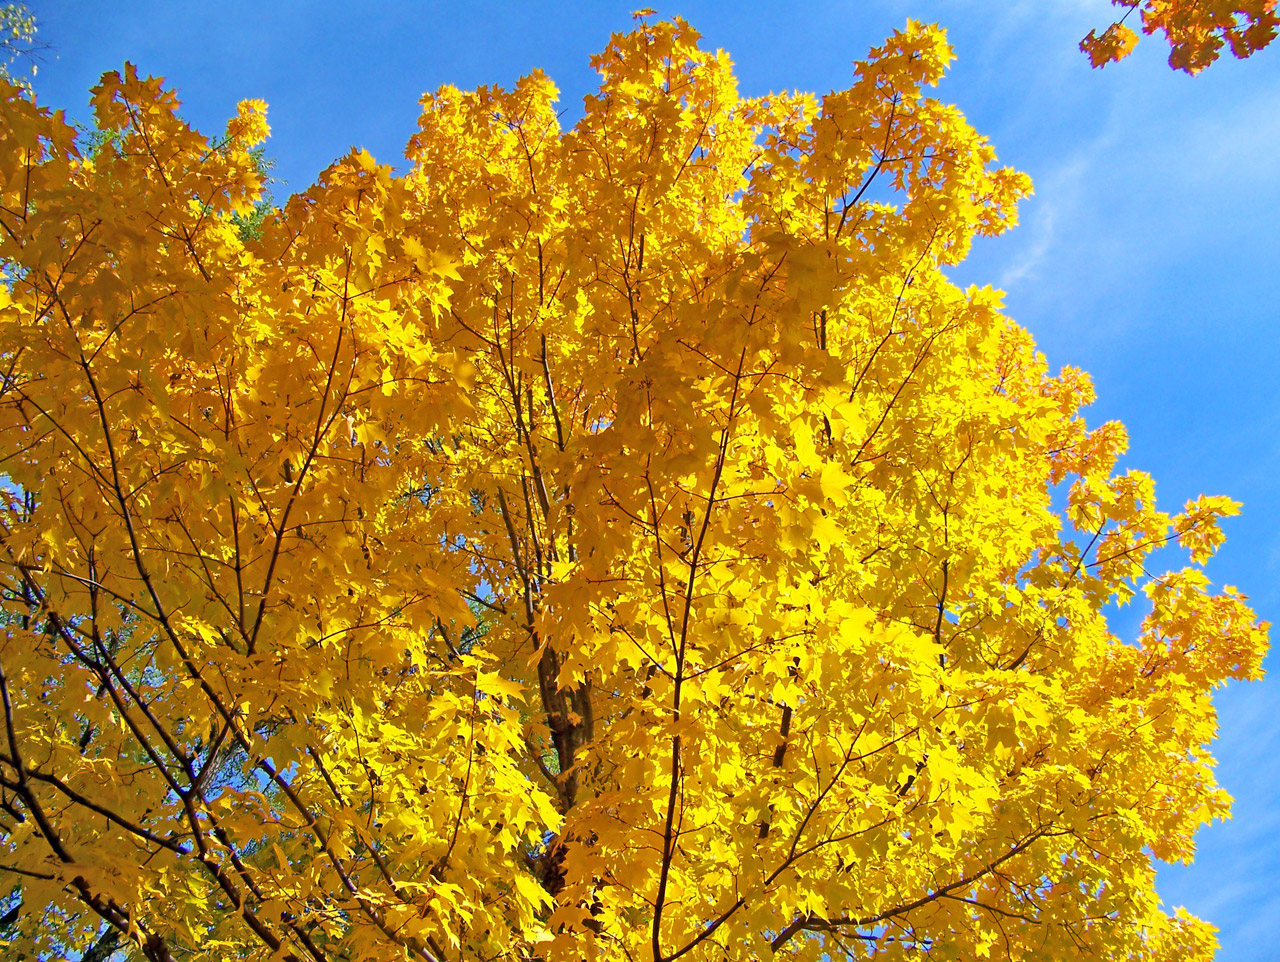 Yellow Maple Tree Branches Free Stock Photo